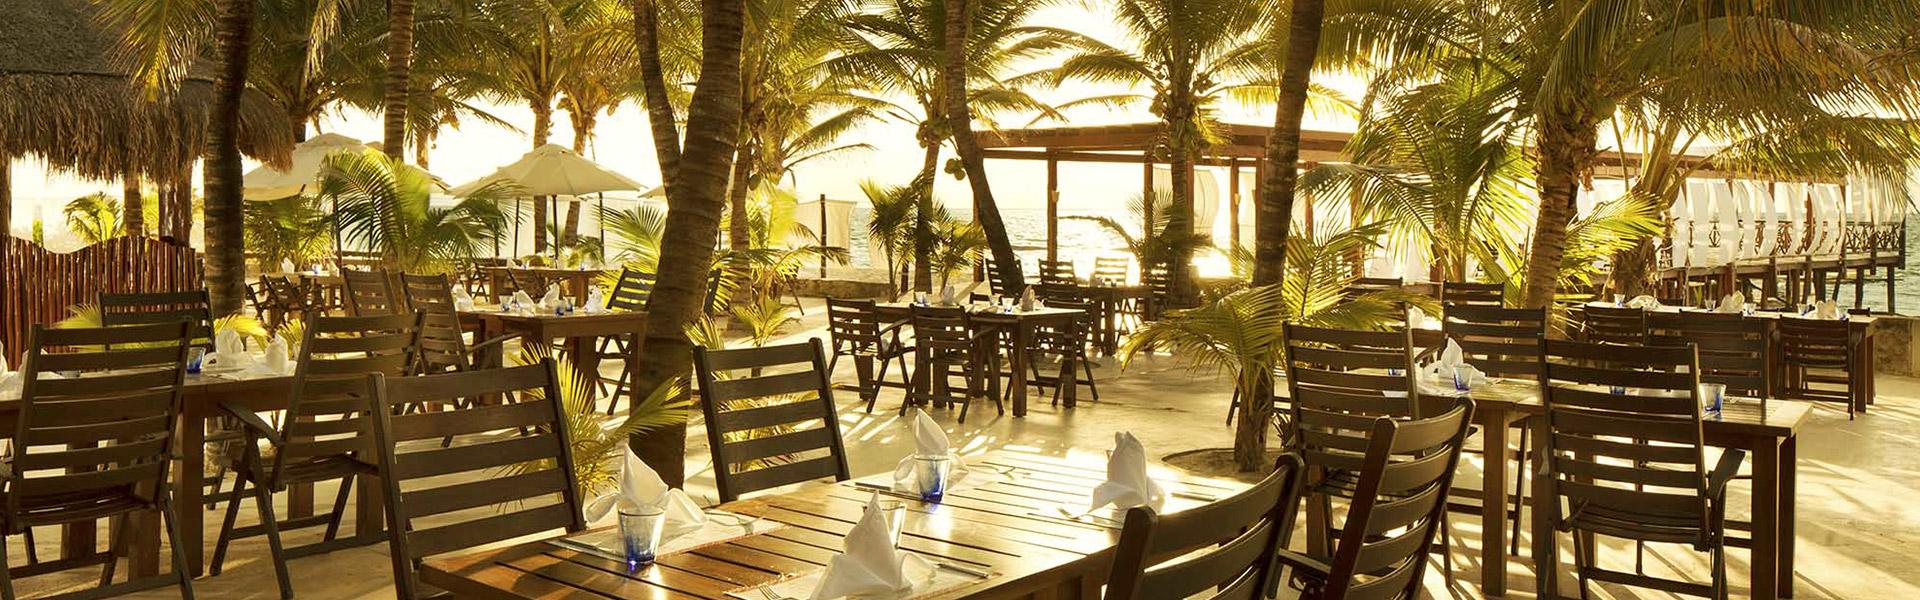 Jo S Caribbean Seaside Grill Seafood